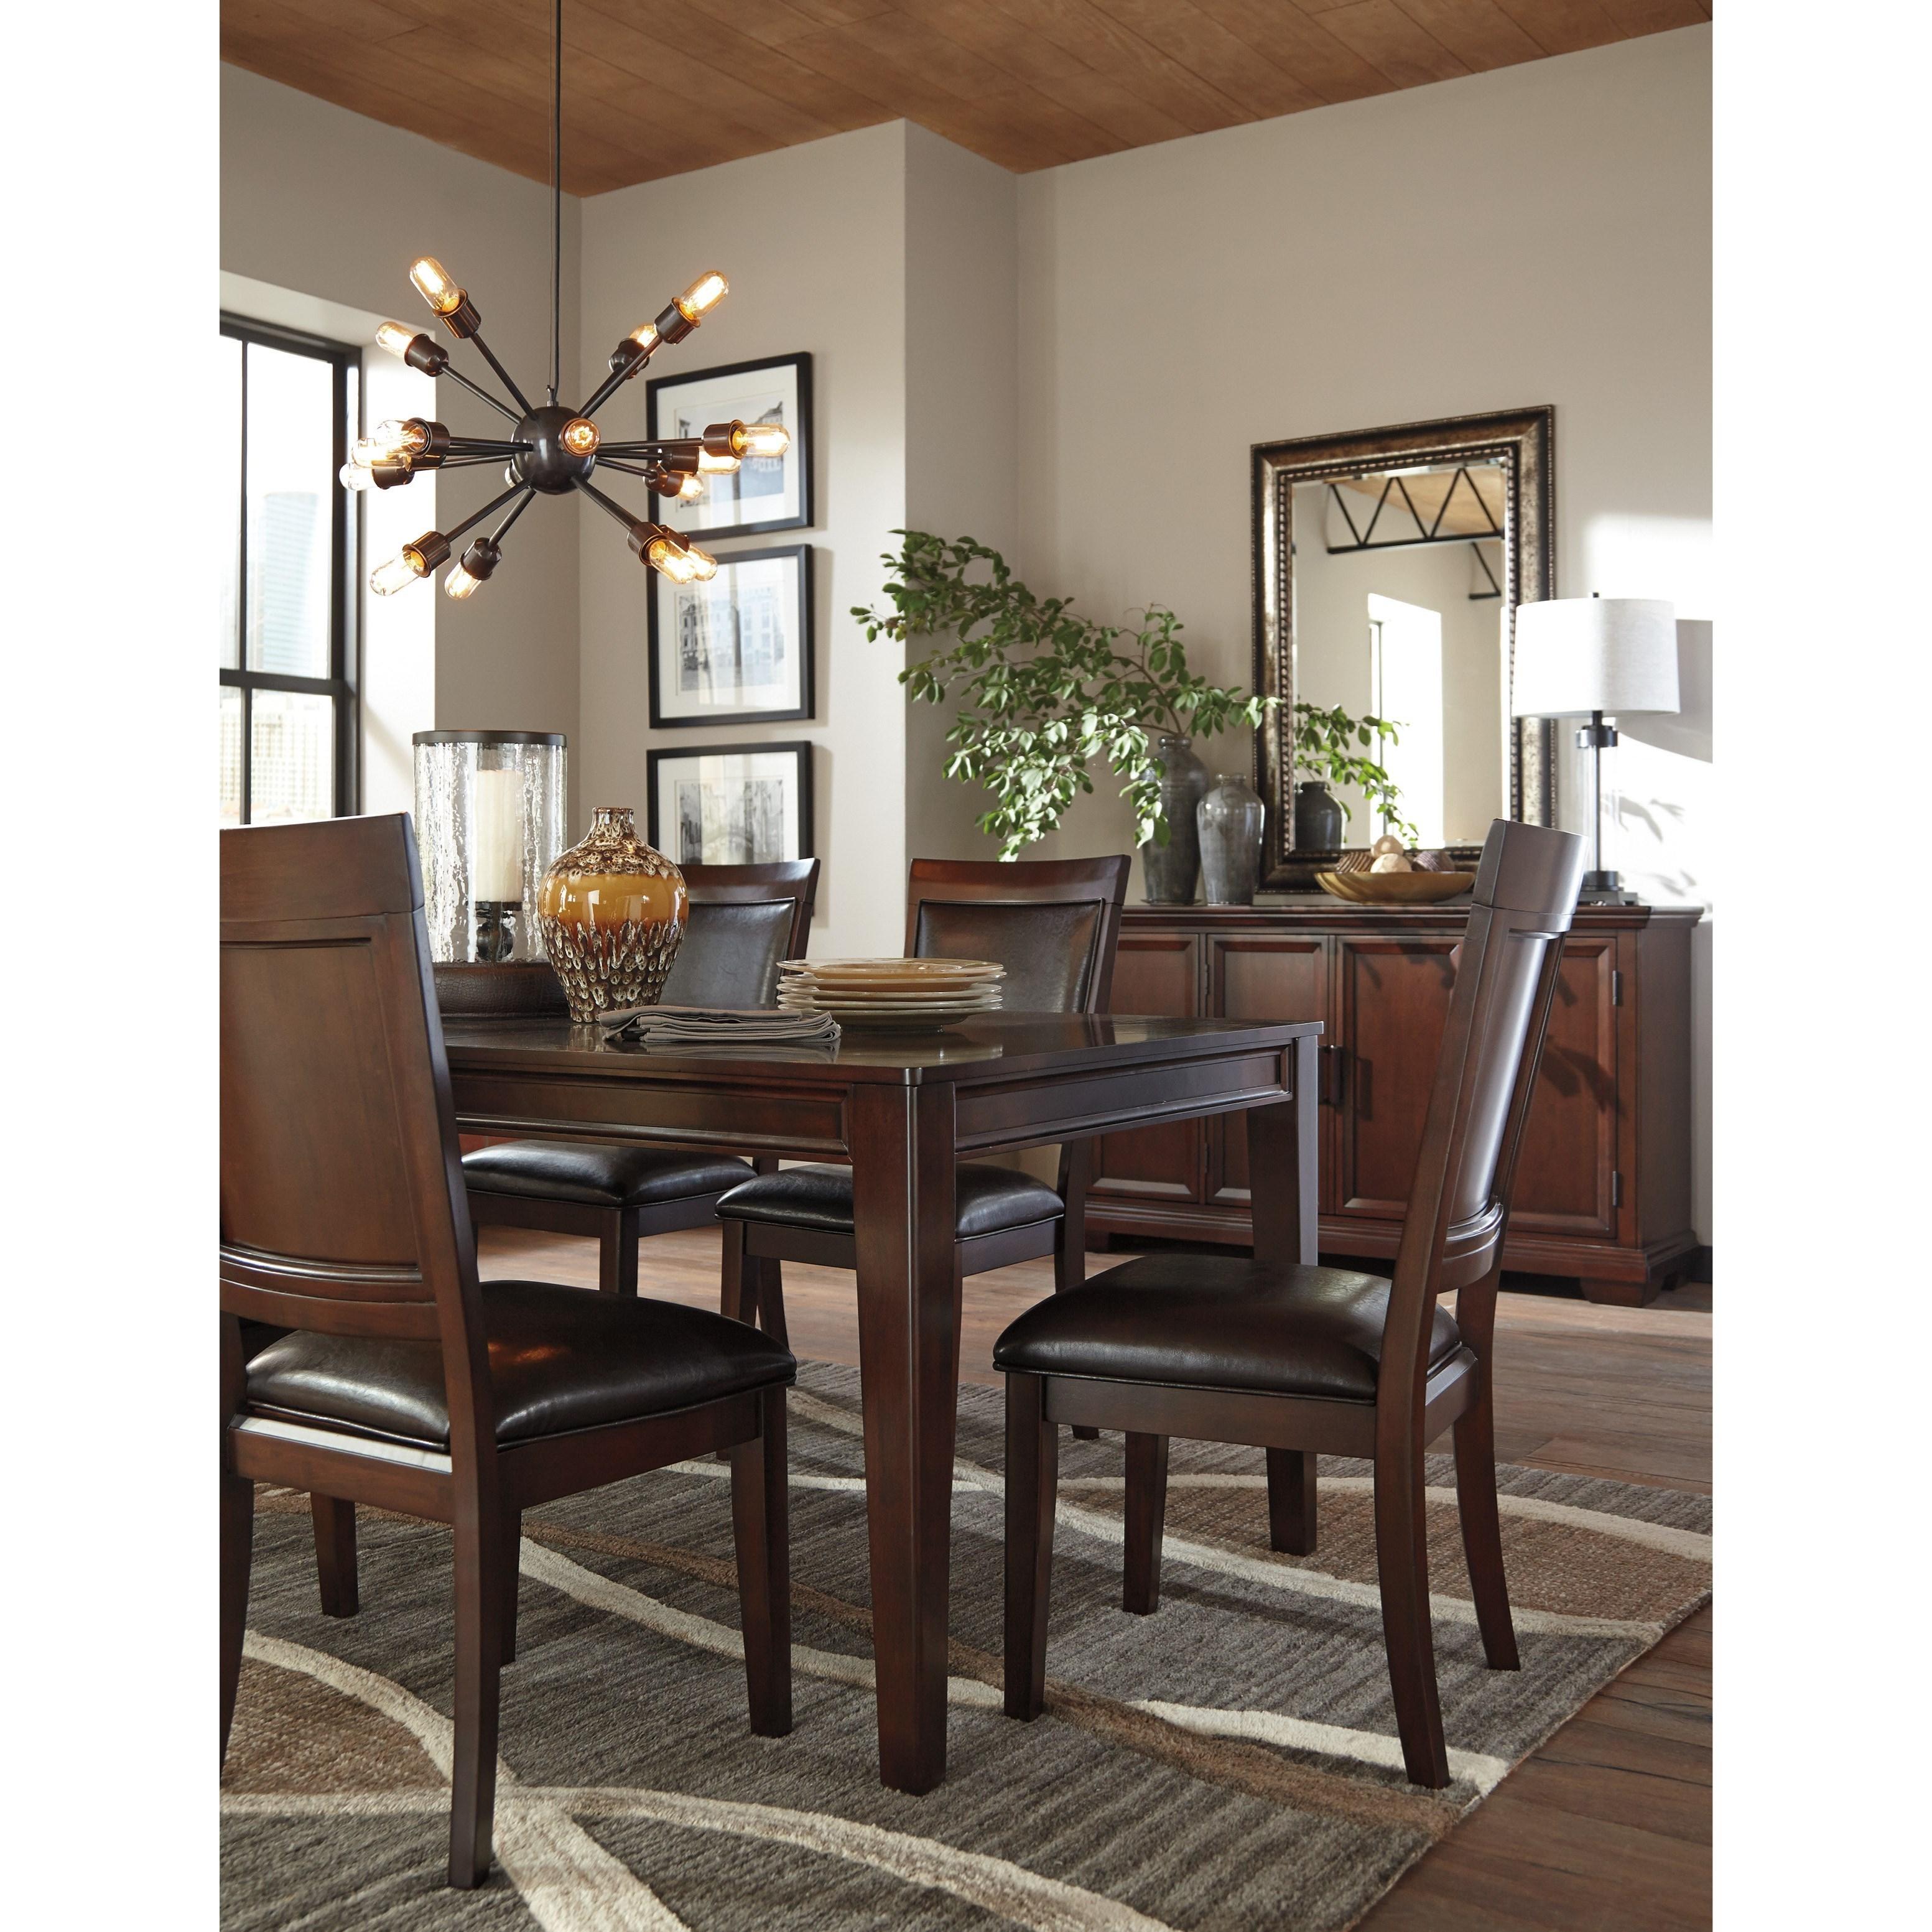 Ashley signature design shadyn d471 35 rectangular dining for Furniture 35